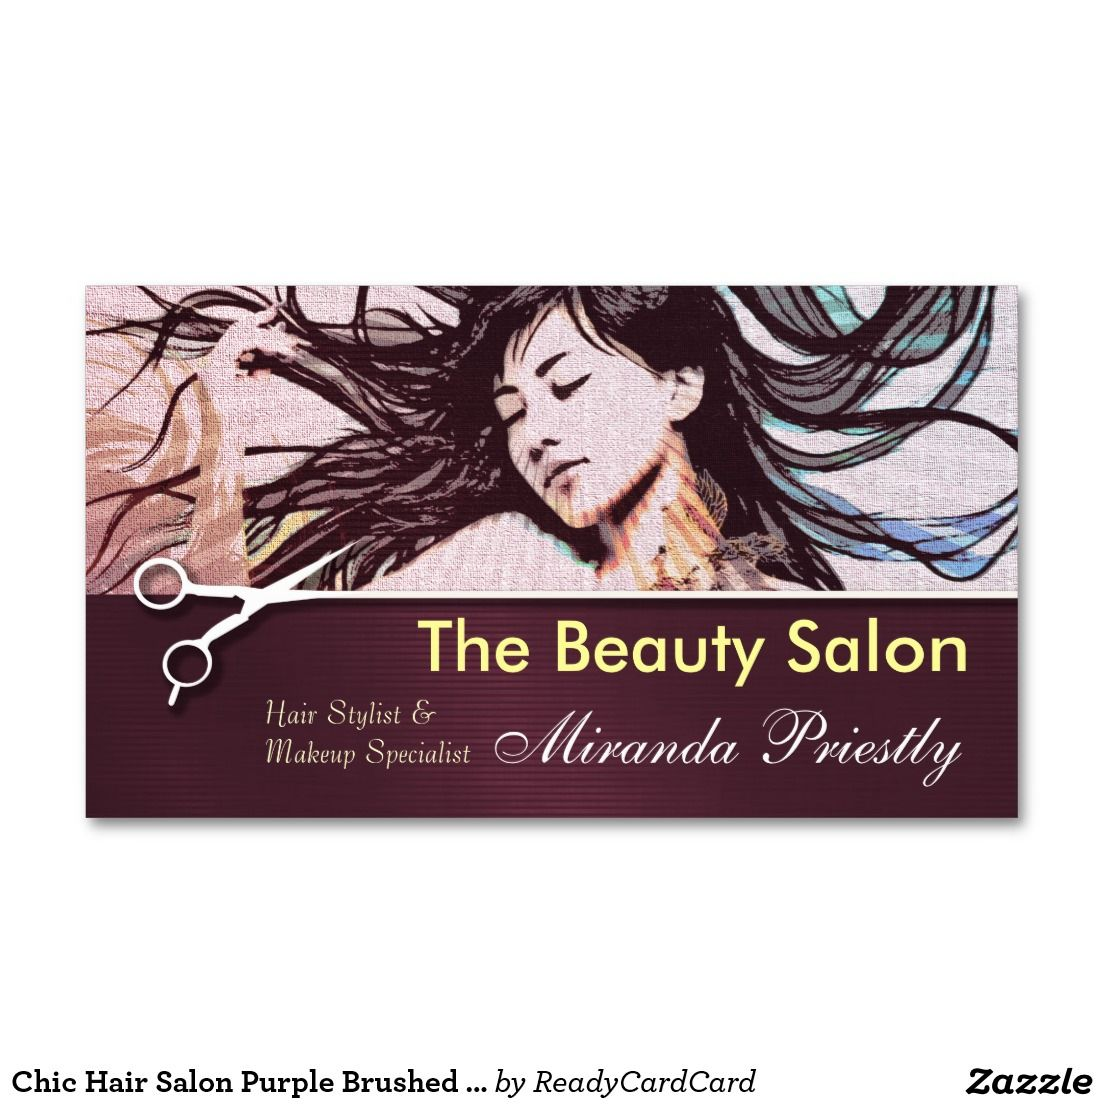 Chic Hair Salon Purple Brushed Metal Business Card | Brushed metal ...